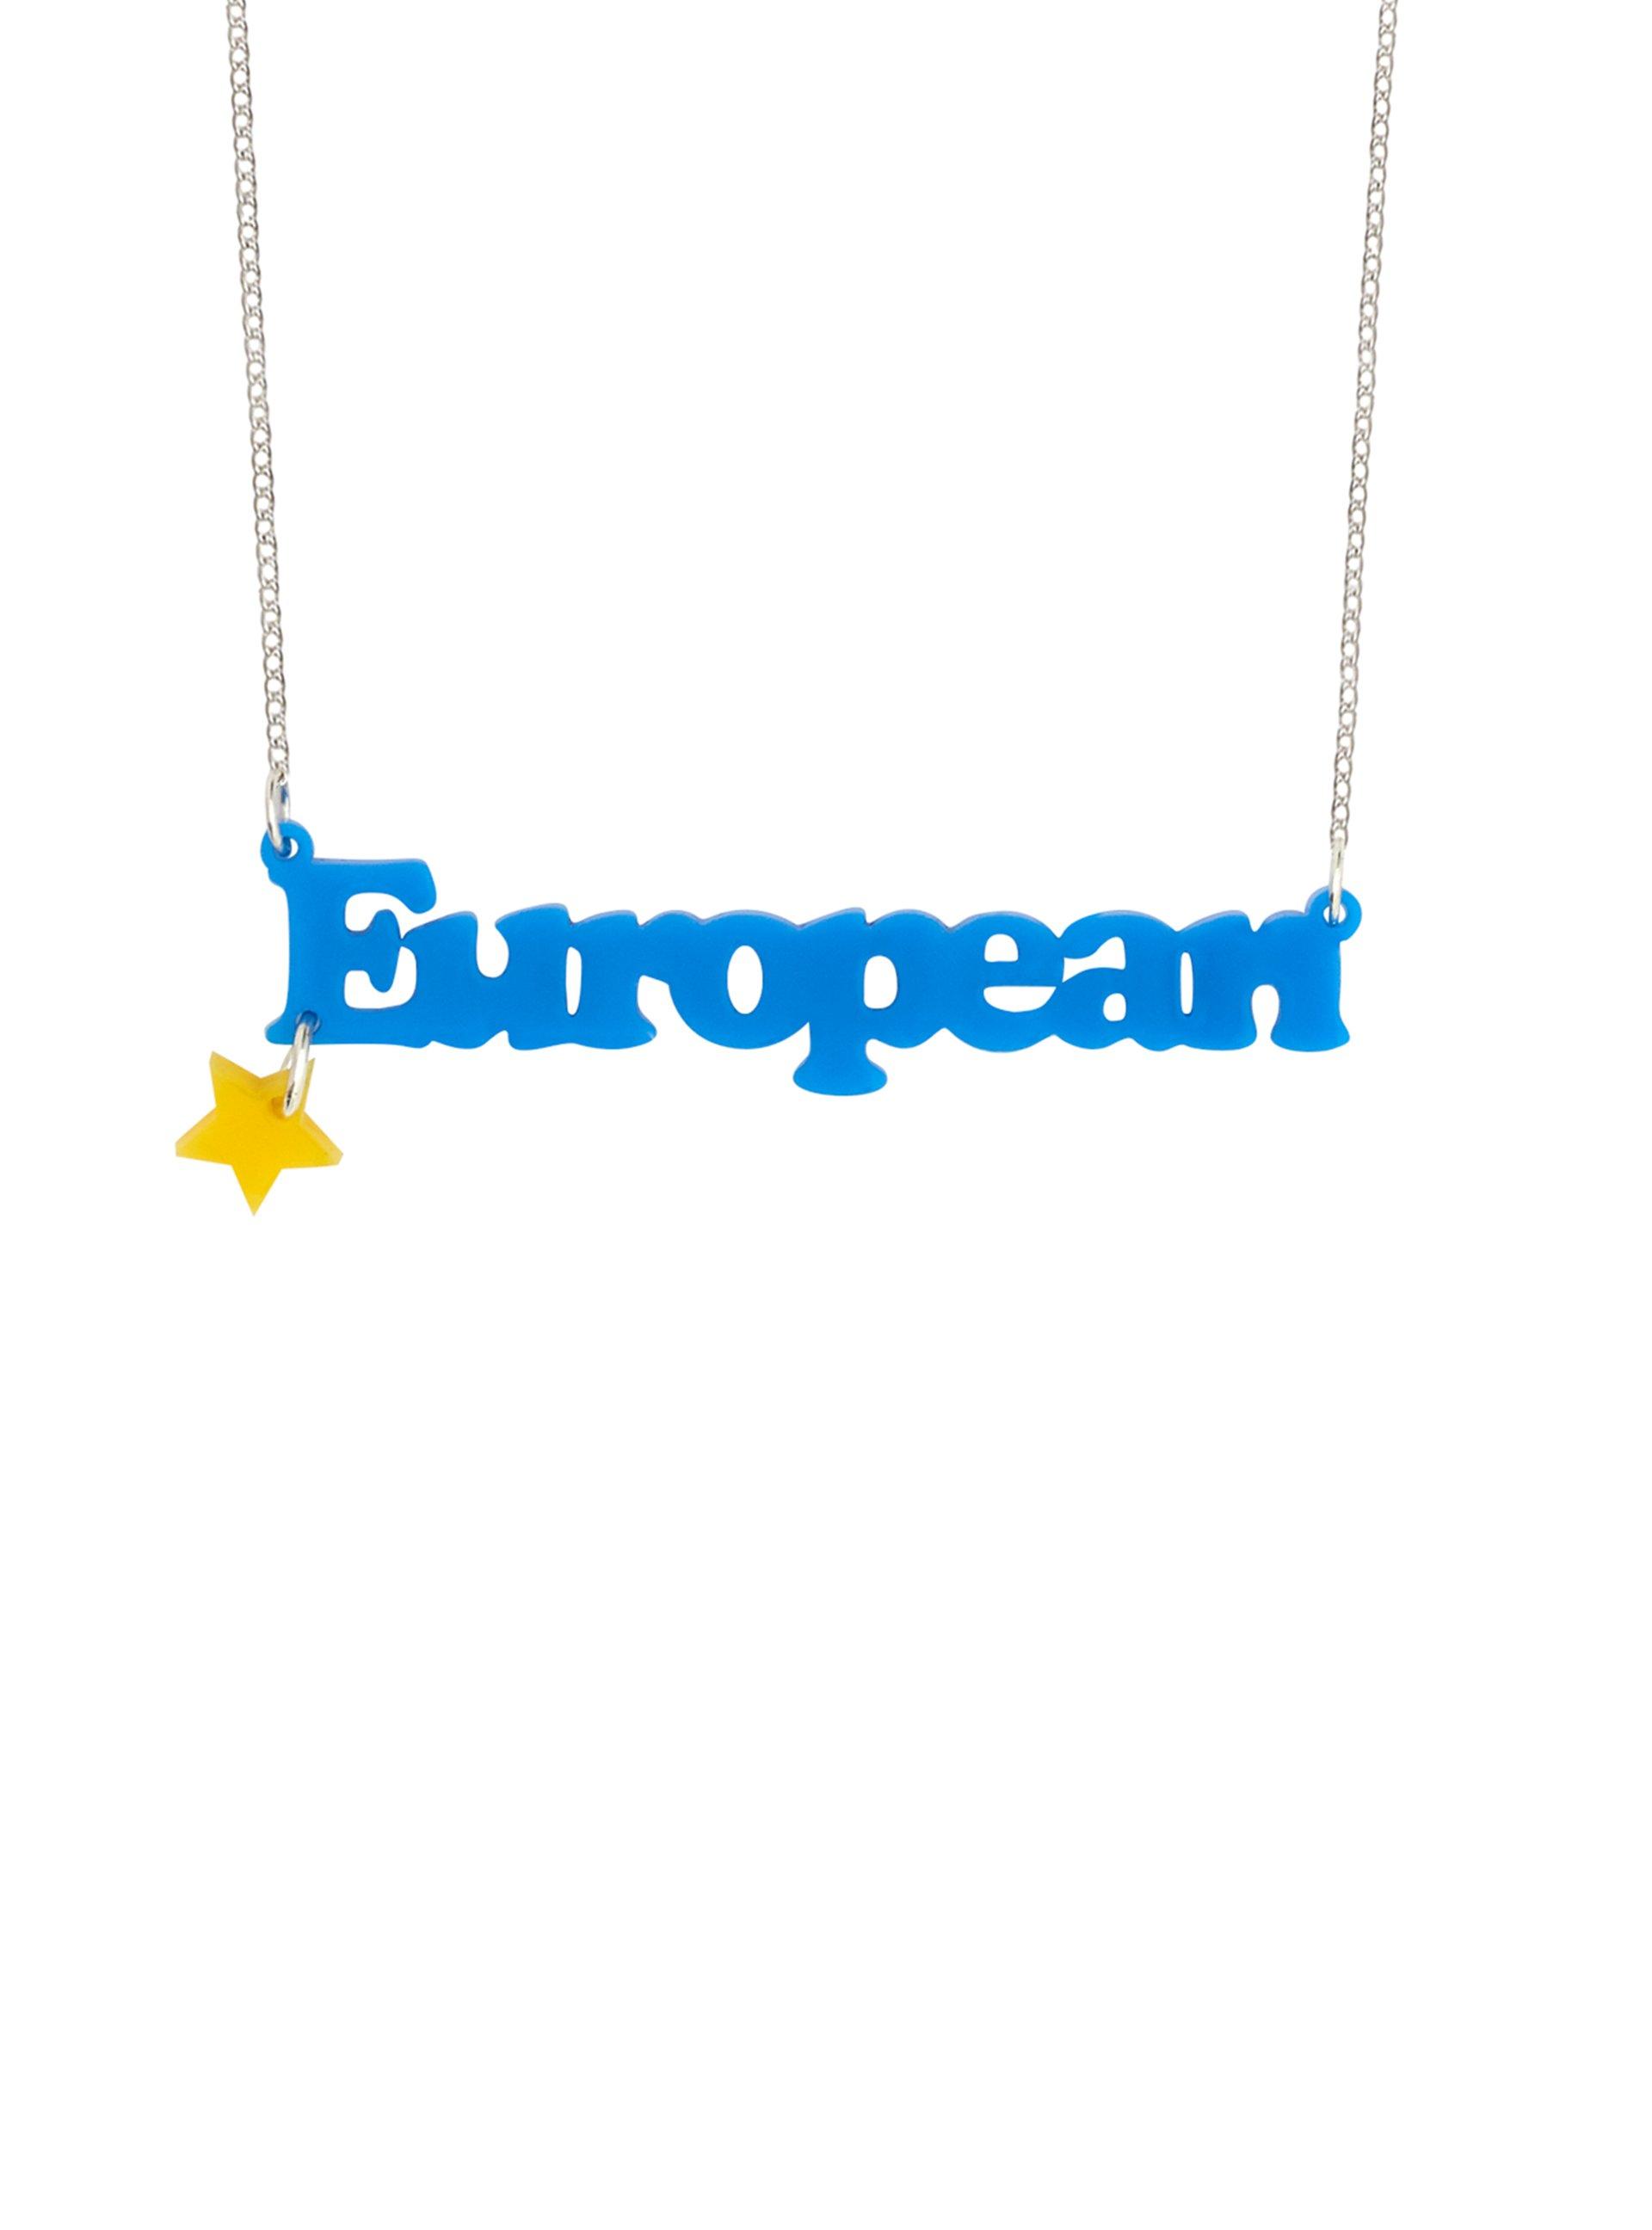 i-heart-europe-necklace_1920x.progressive